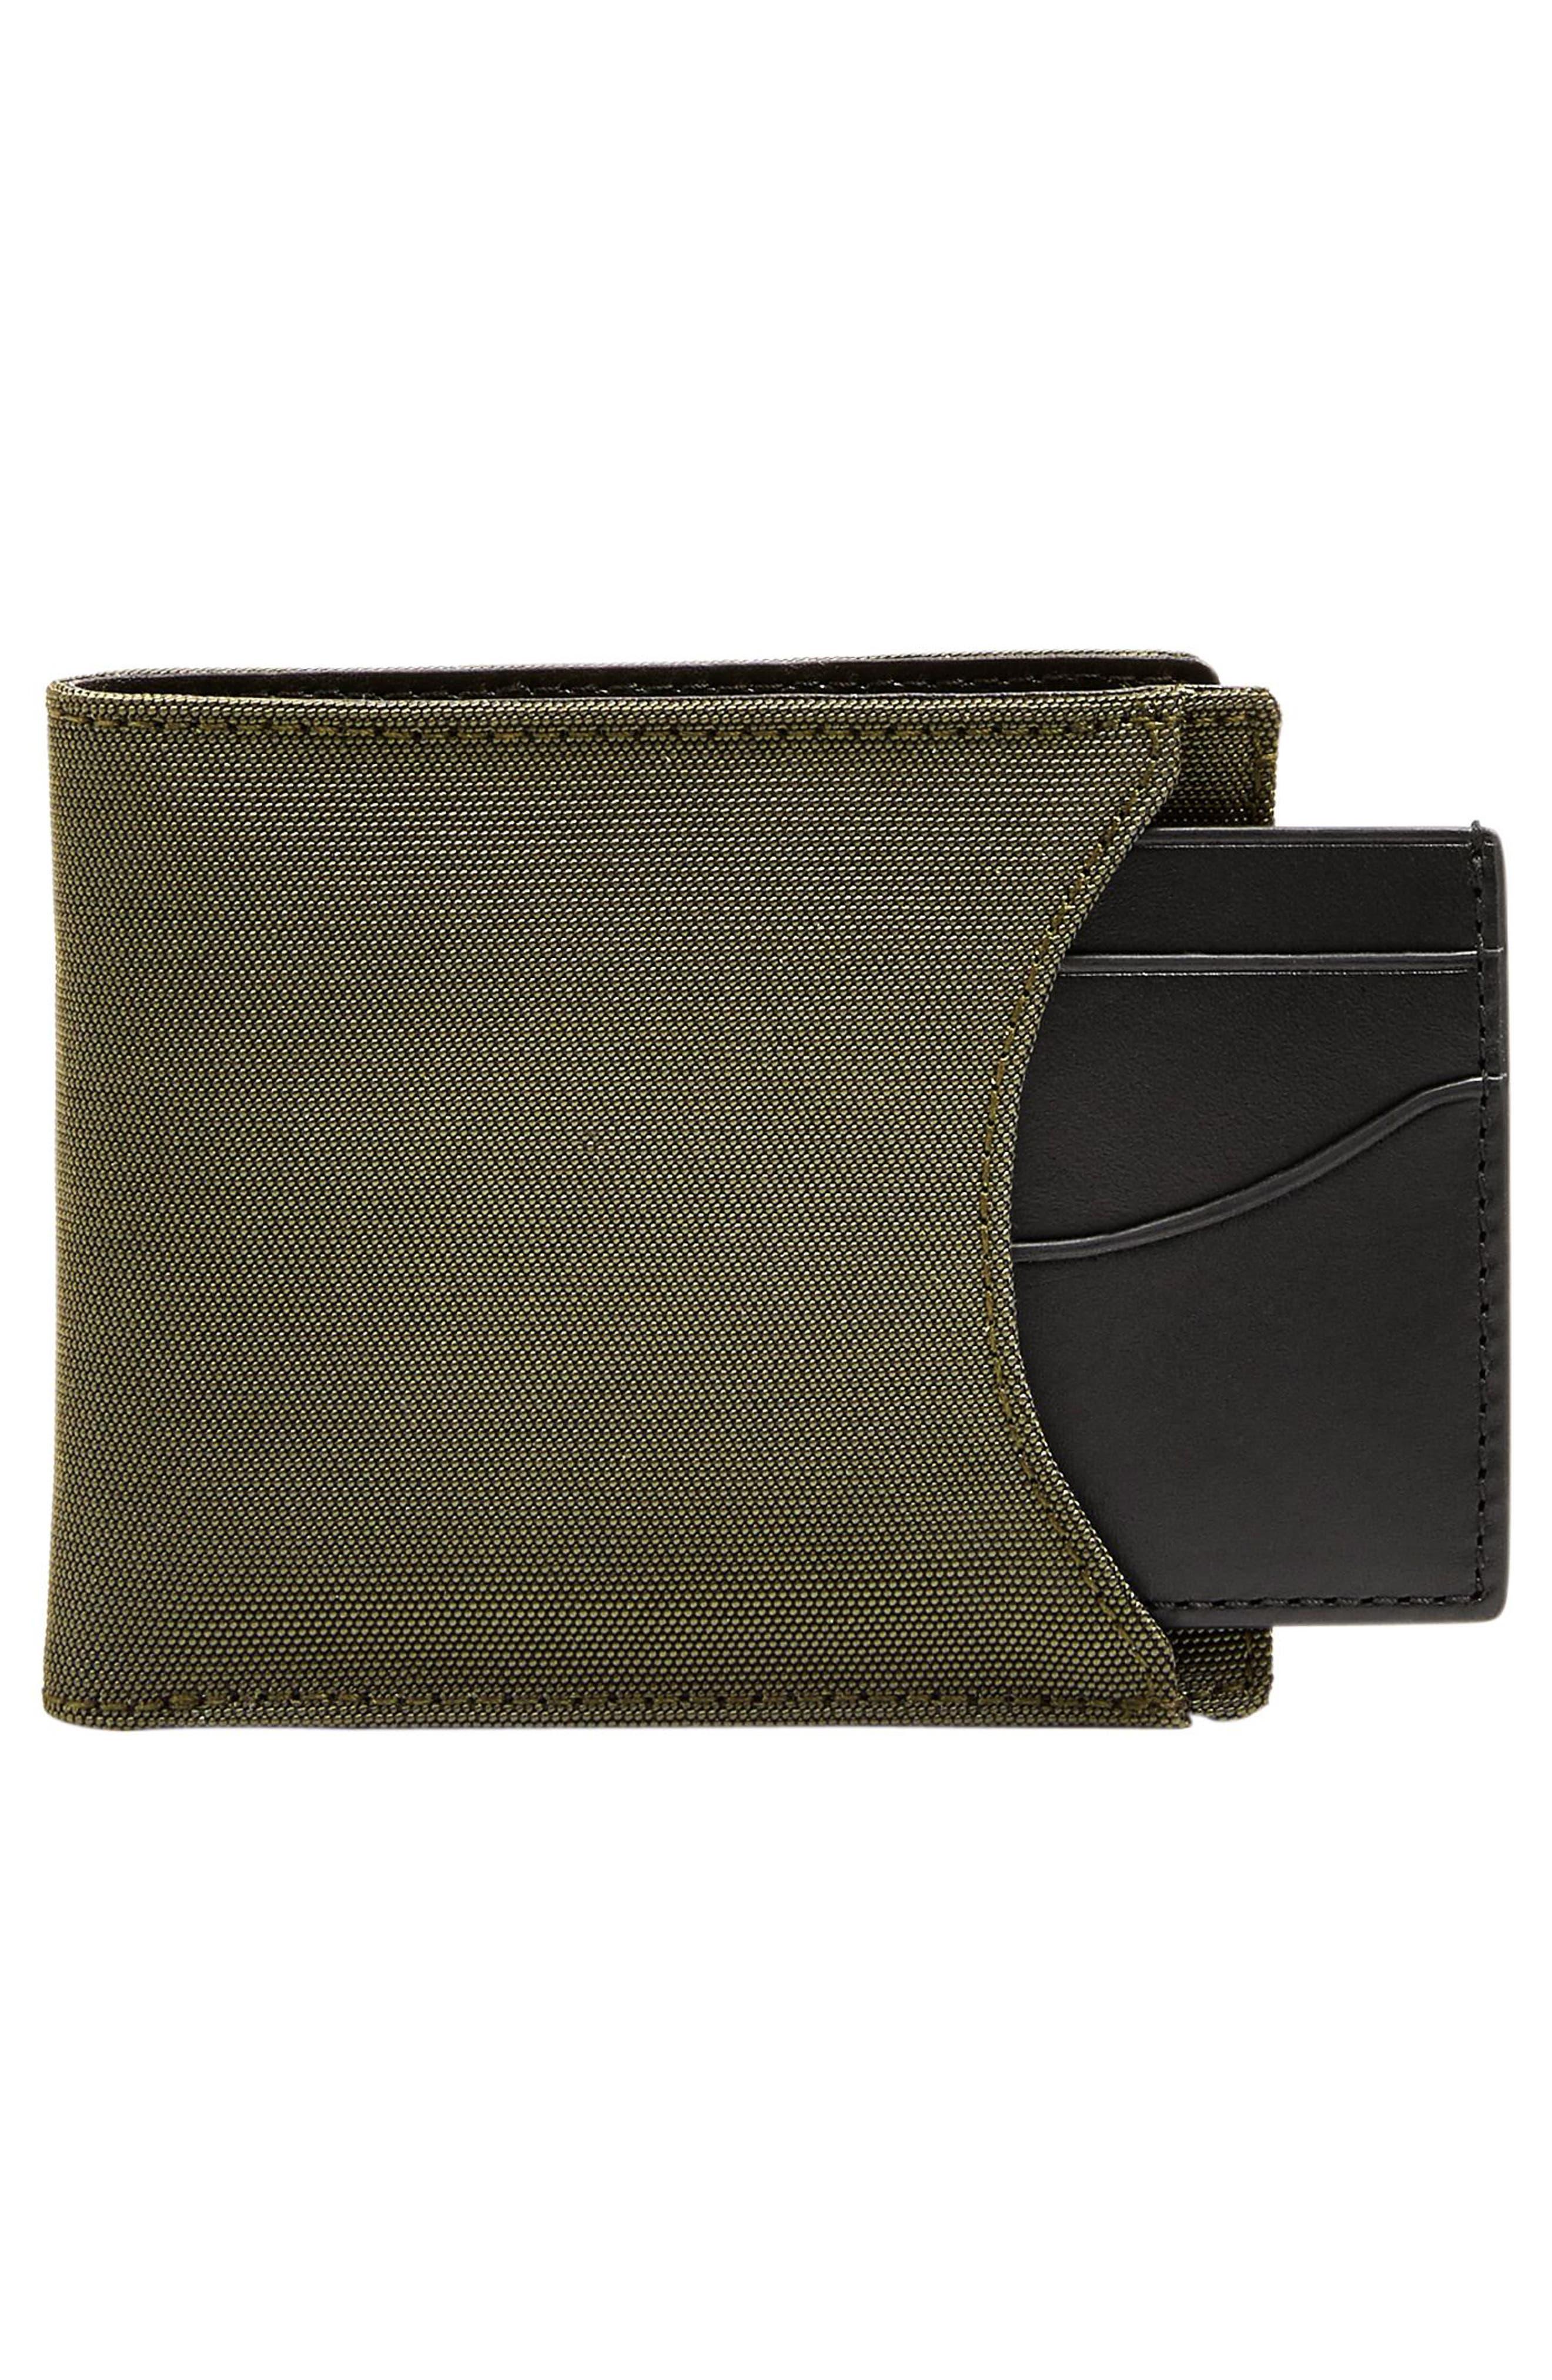 Passcase Wallet,                             Alternate thumbnail 3, color,                             Dark Green